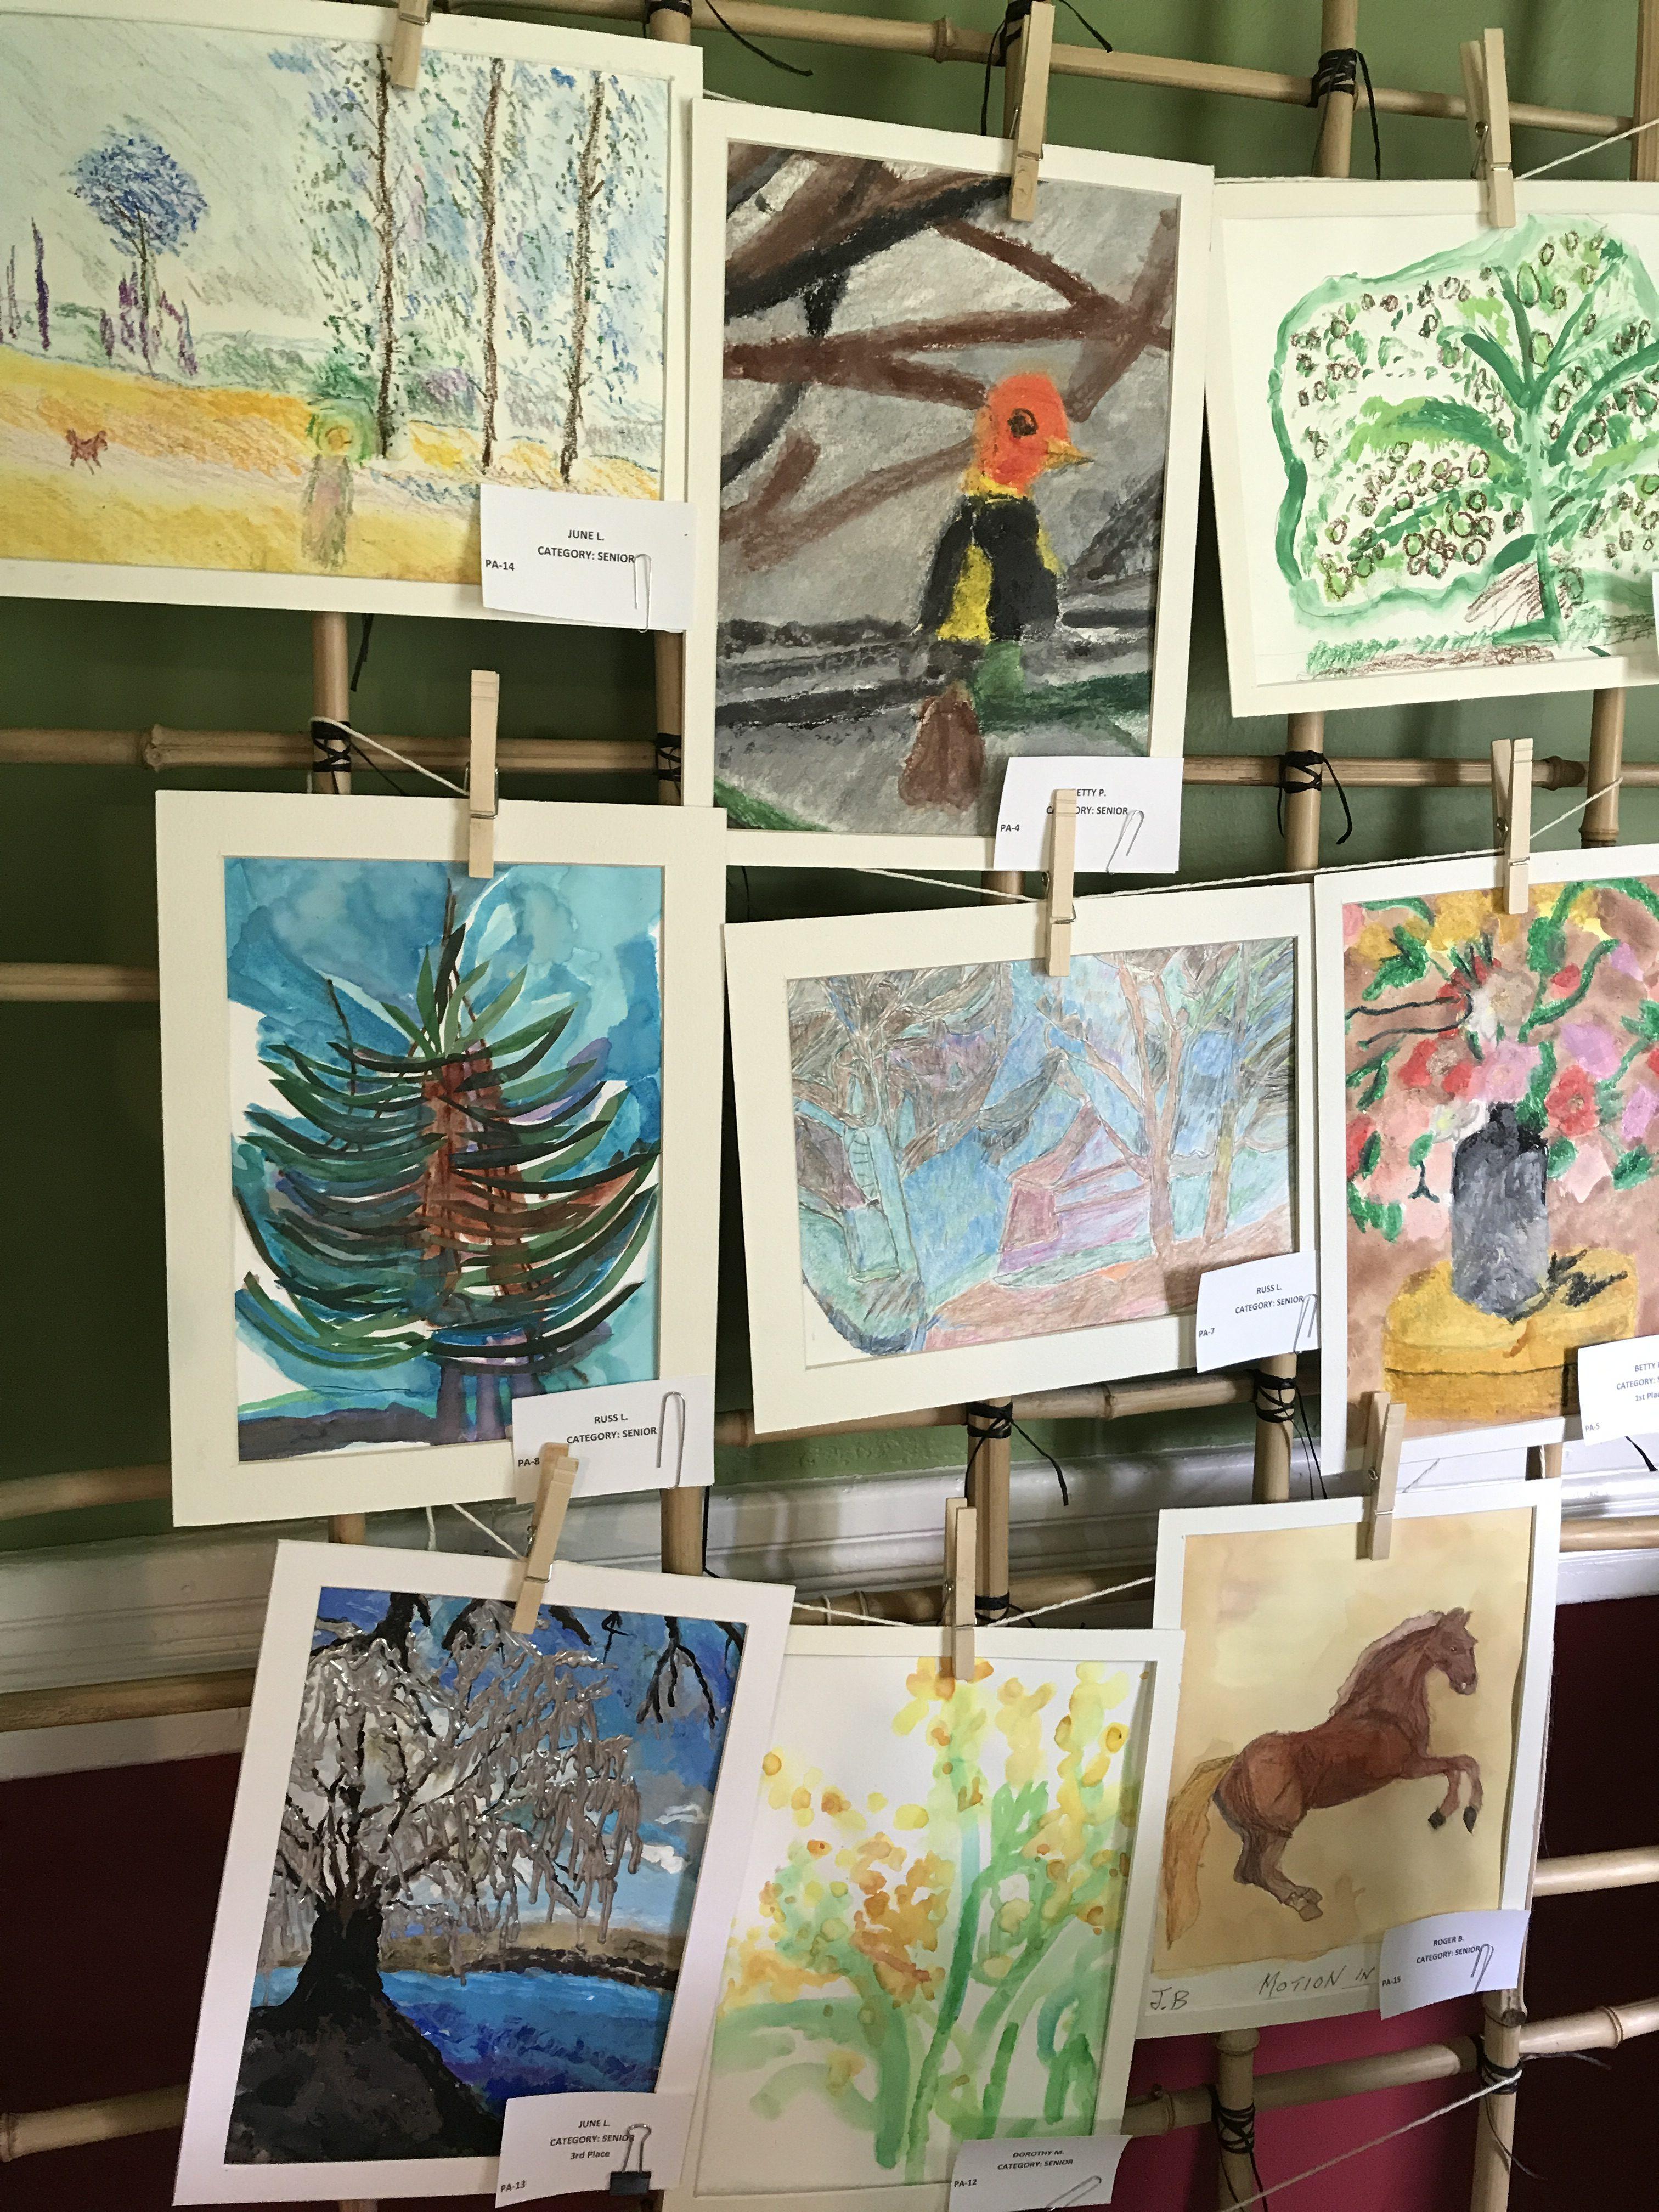 senior division entries in the Arbor Day Art contest